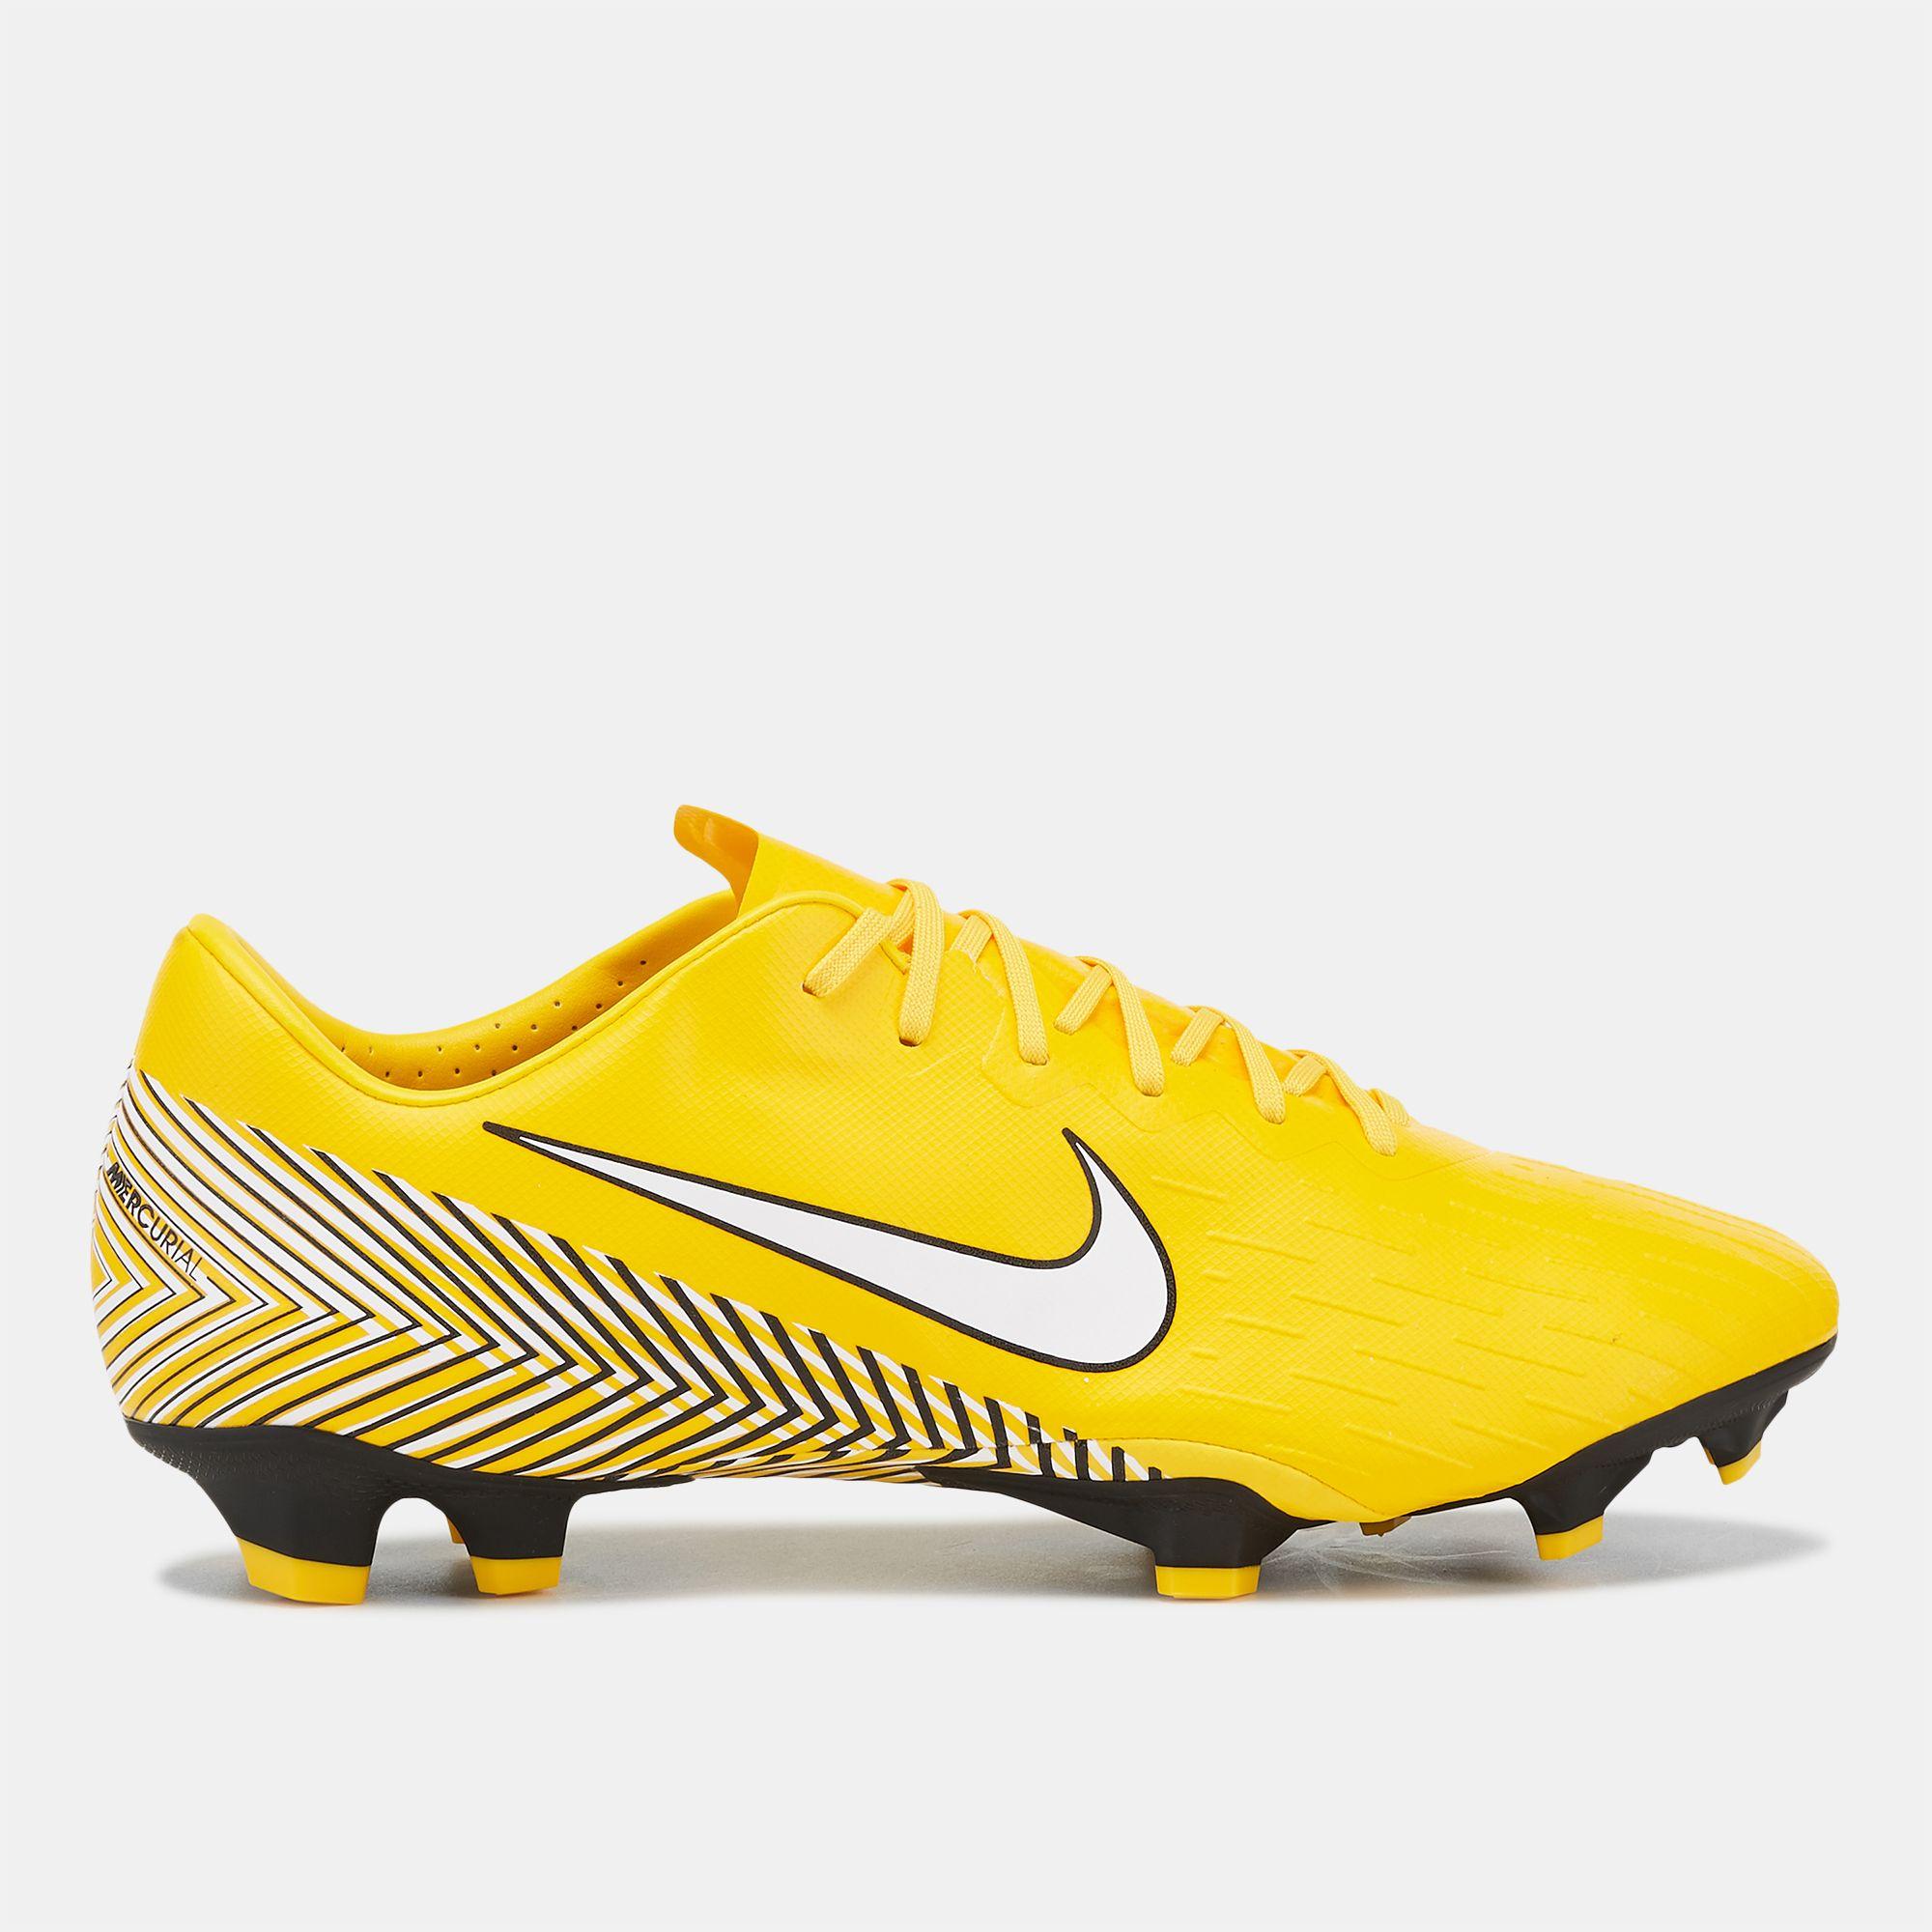 19232ff7d5c8e Nike Mercurial Neymar Jr. Vapor 12 Firm Ground Football Shoe ...